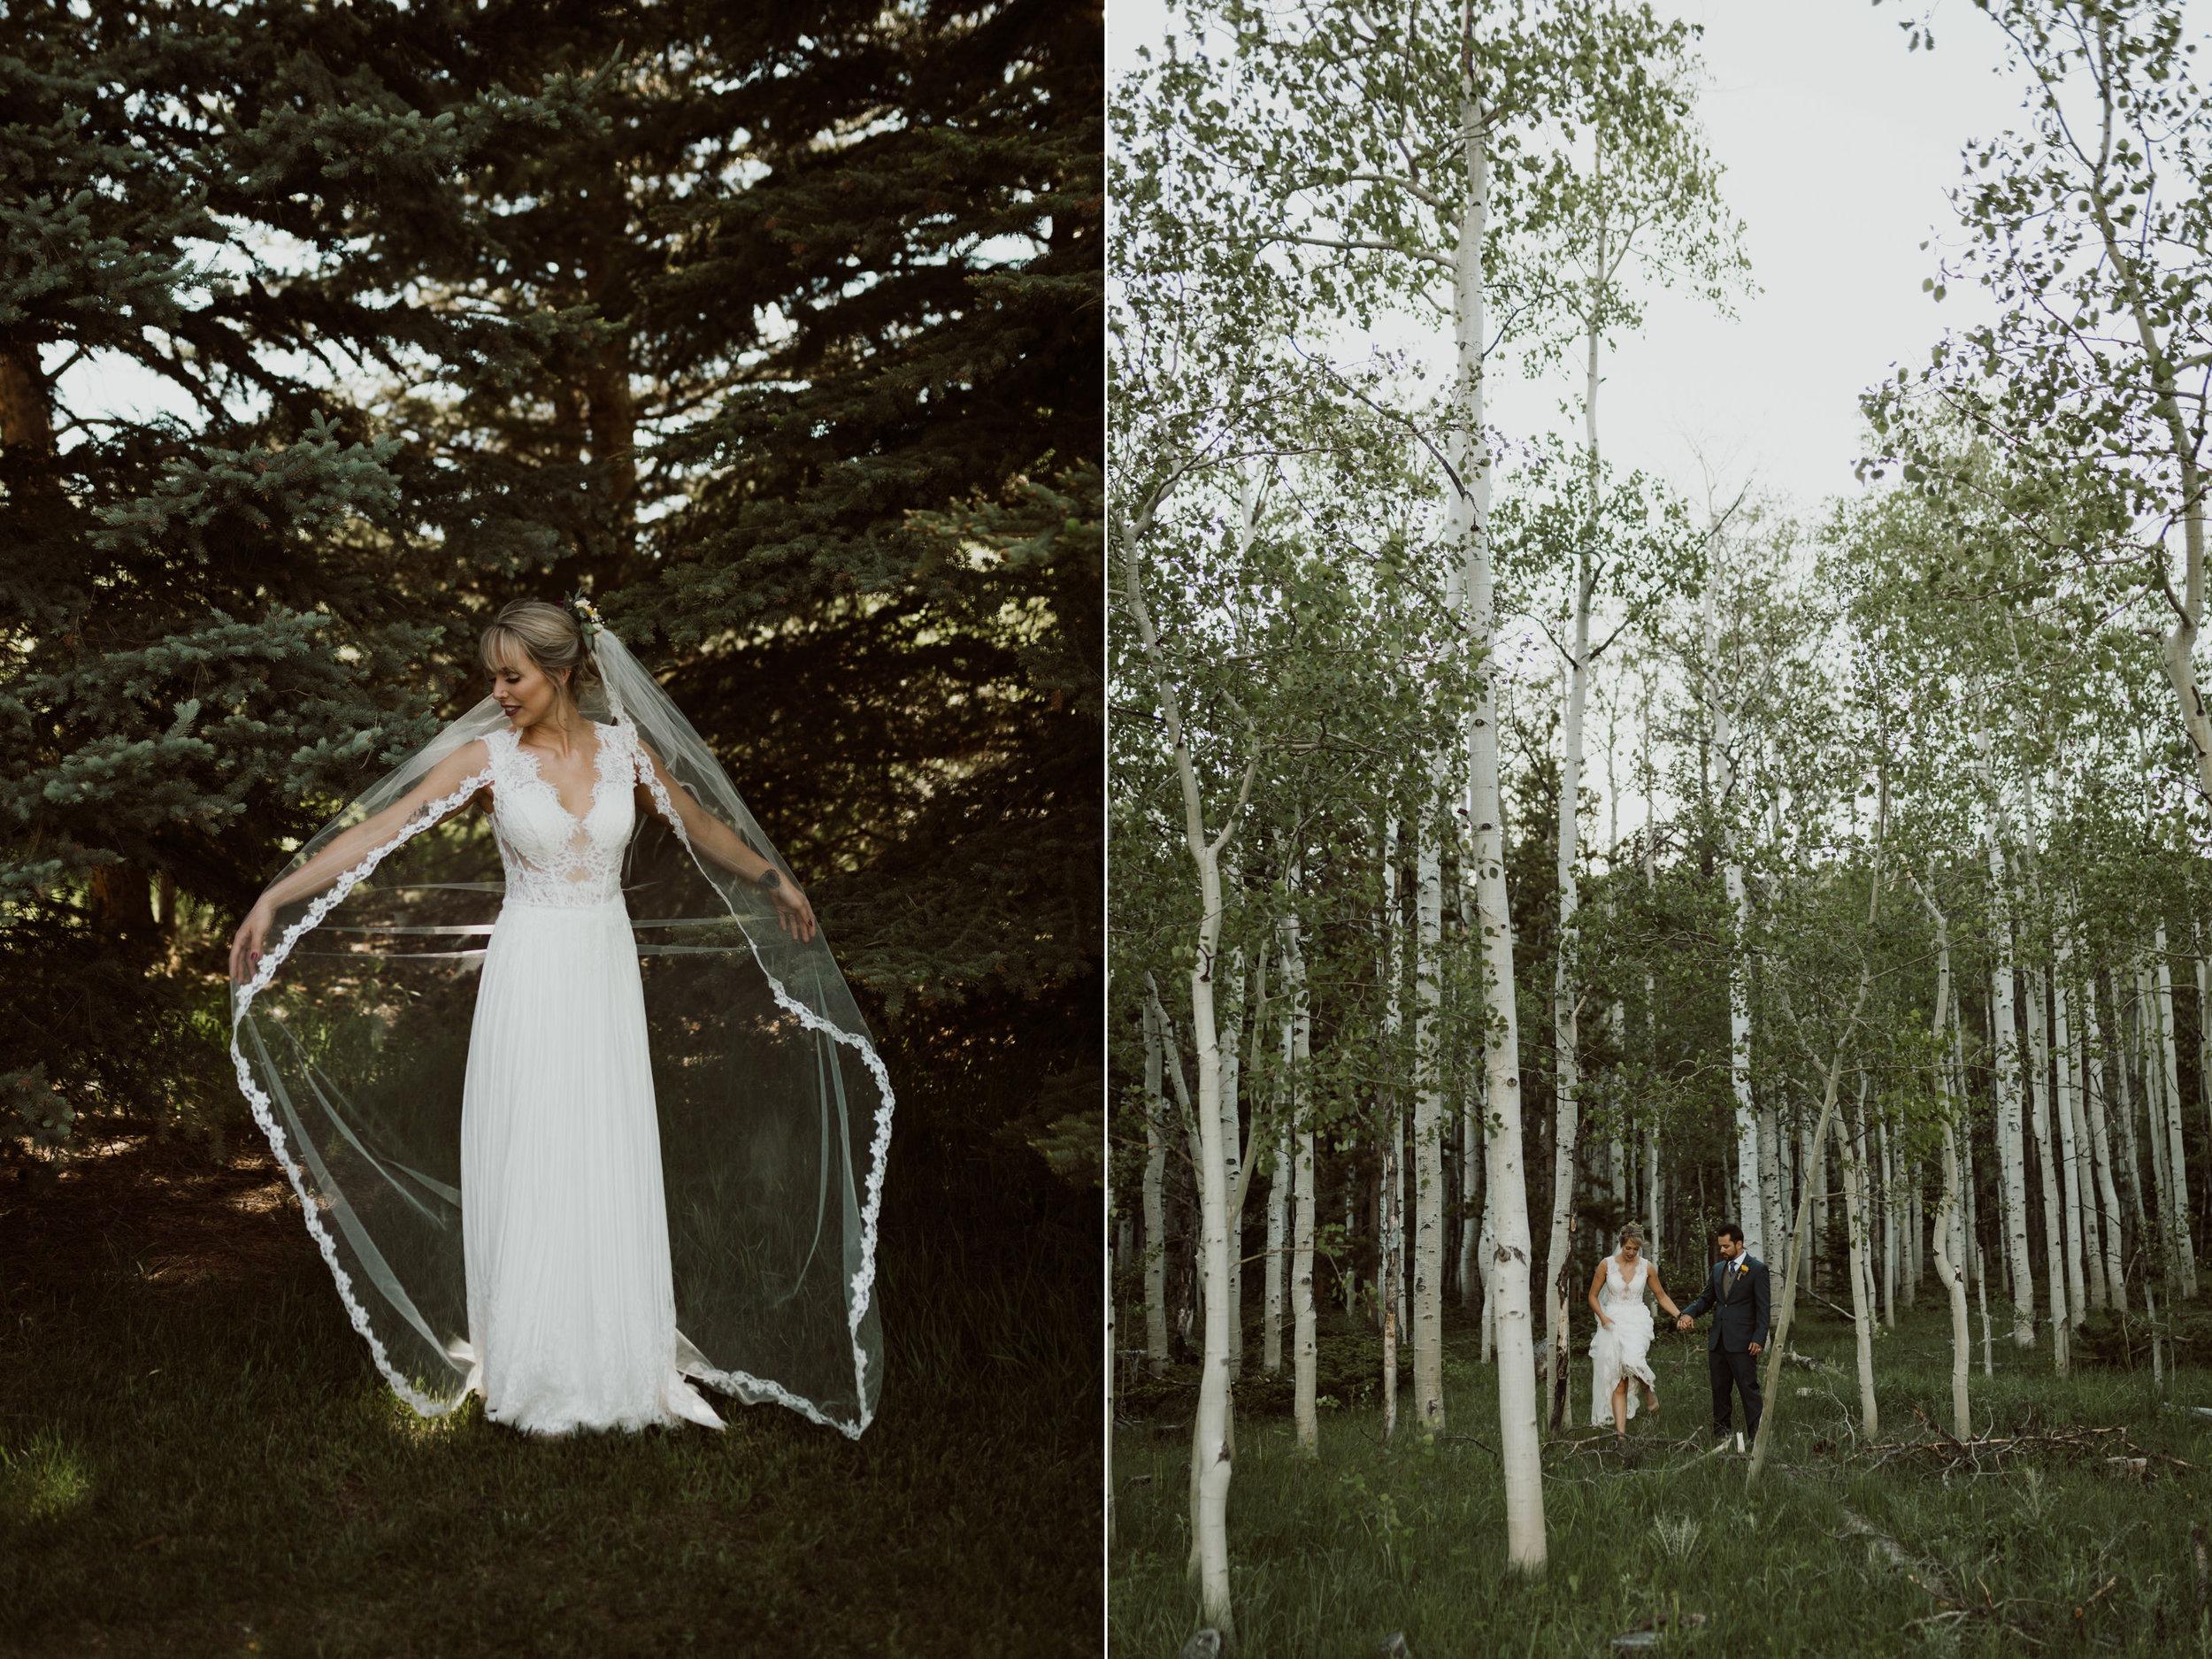 17-6-adventure-wedding-photographer-16.jpg